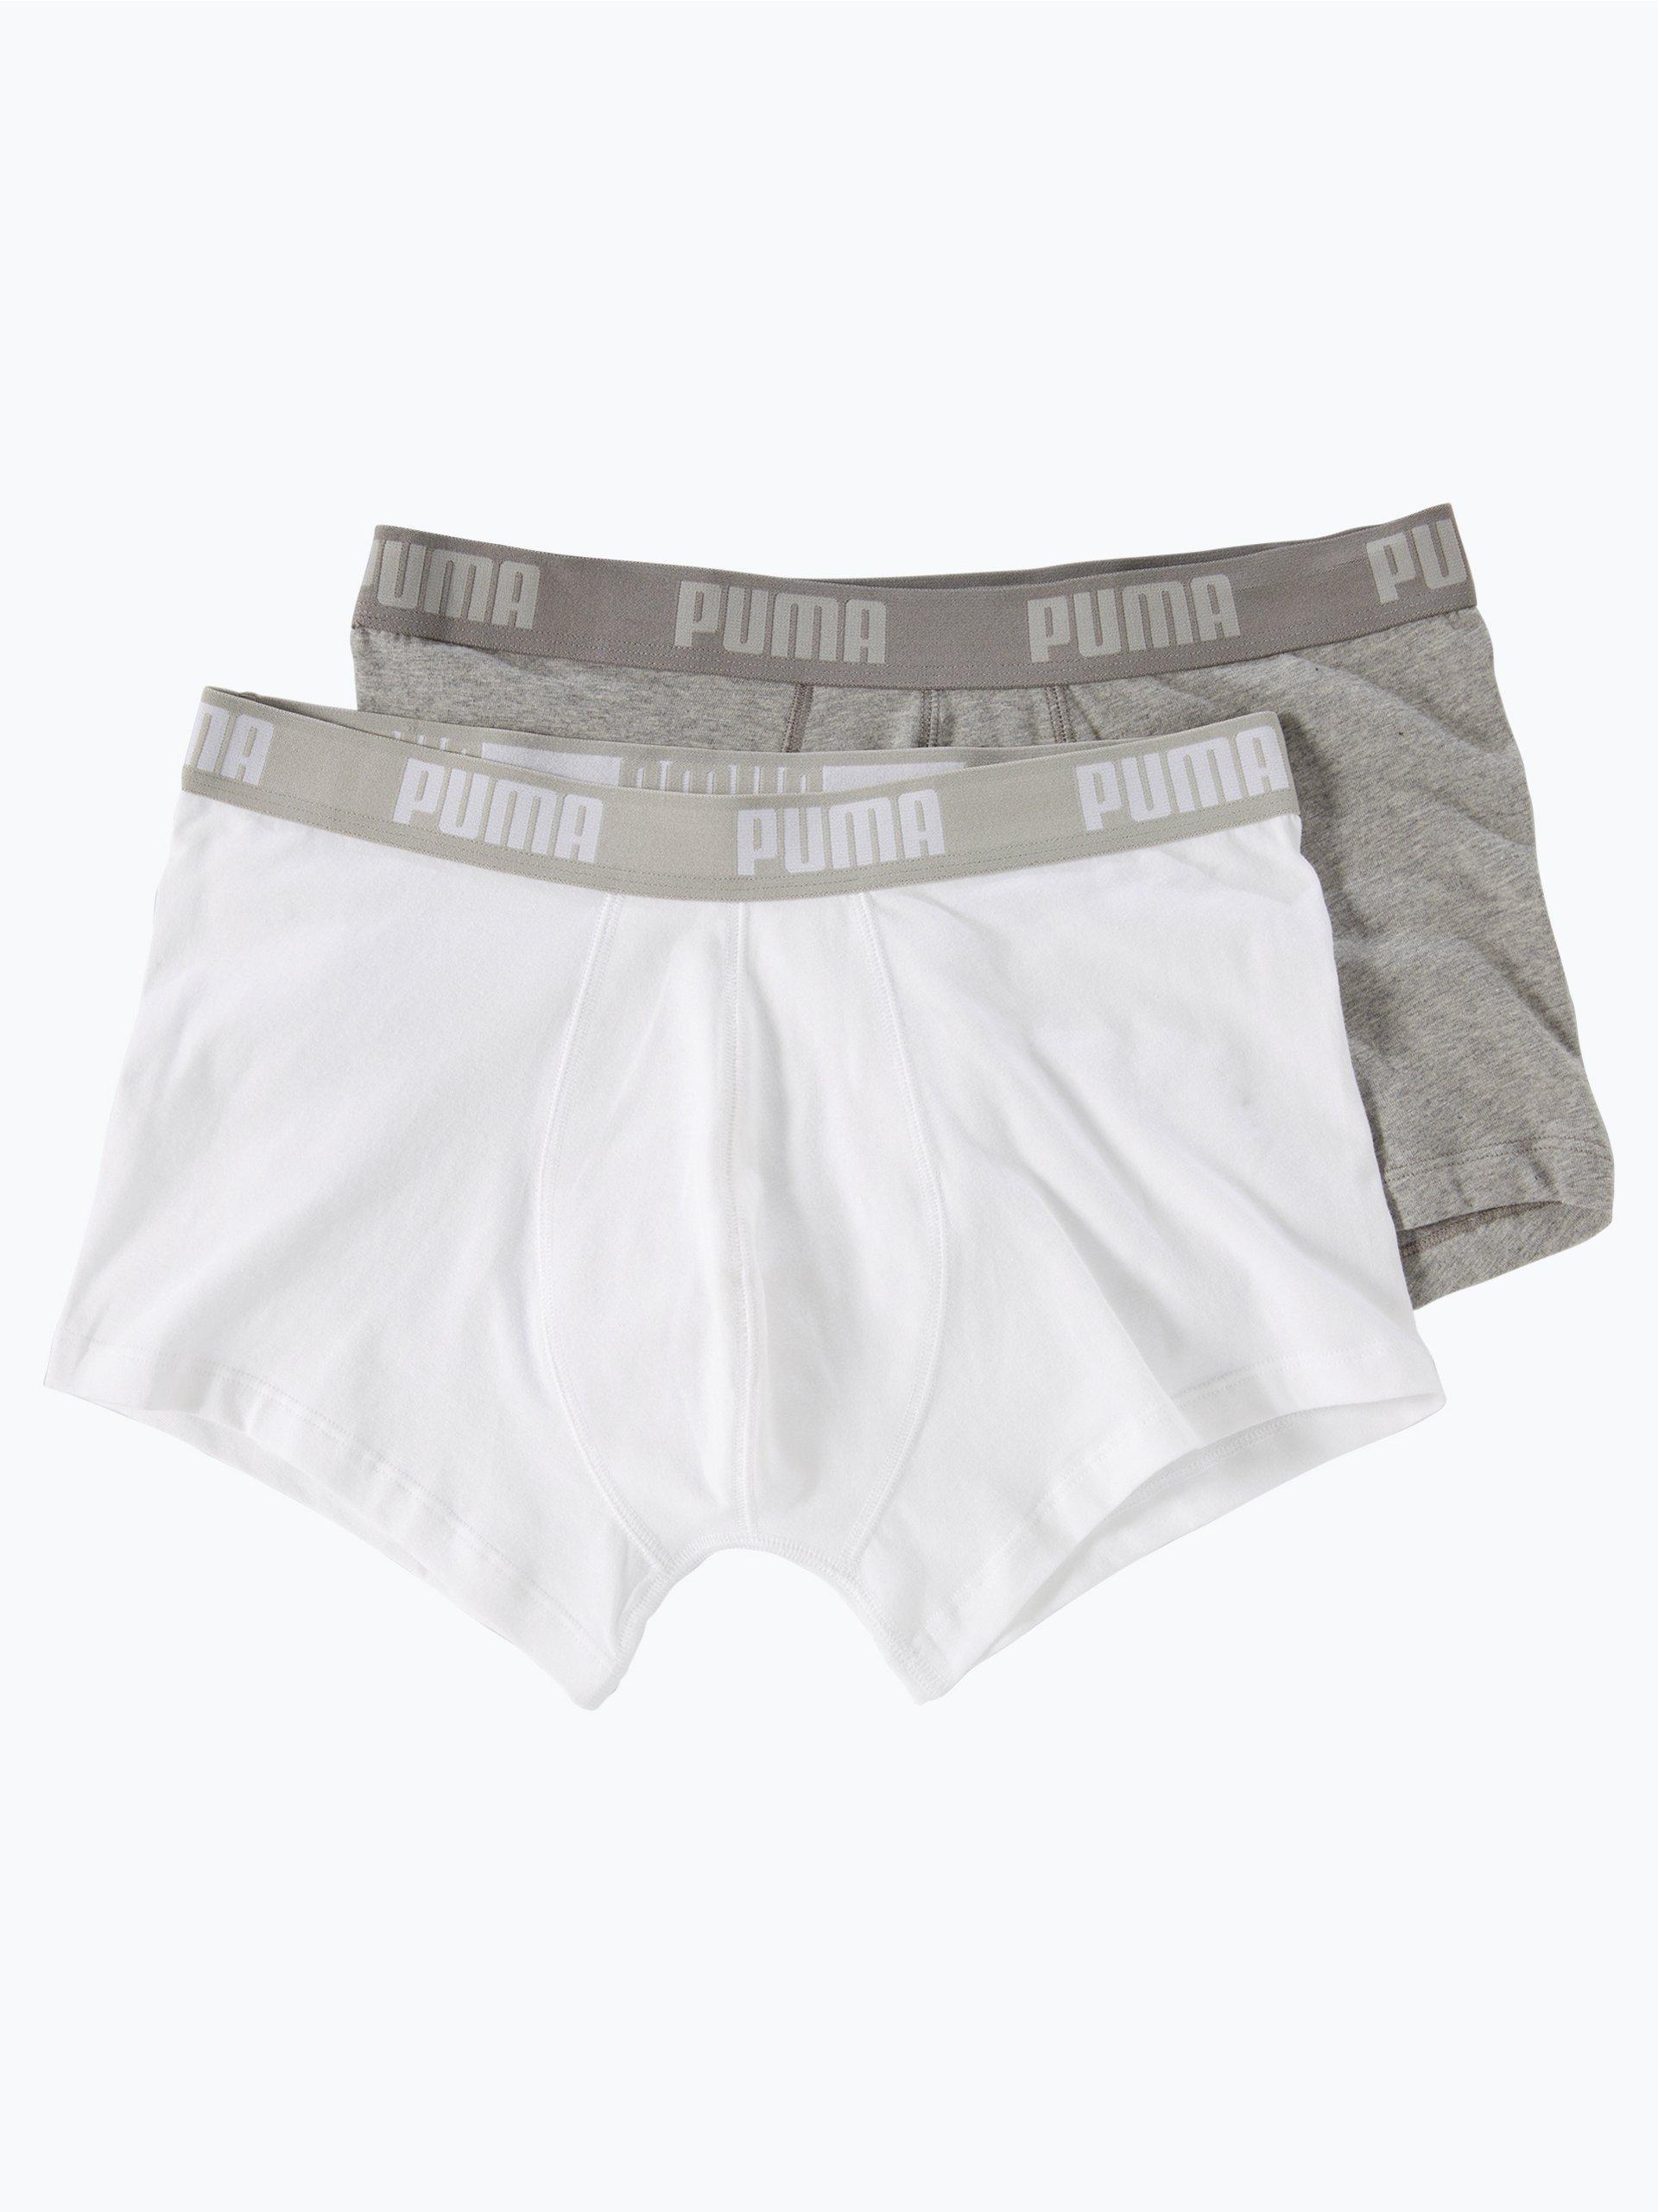 Puma Herren Pants im 2er-Pack